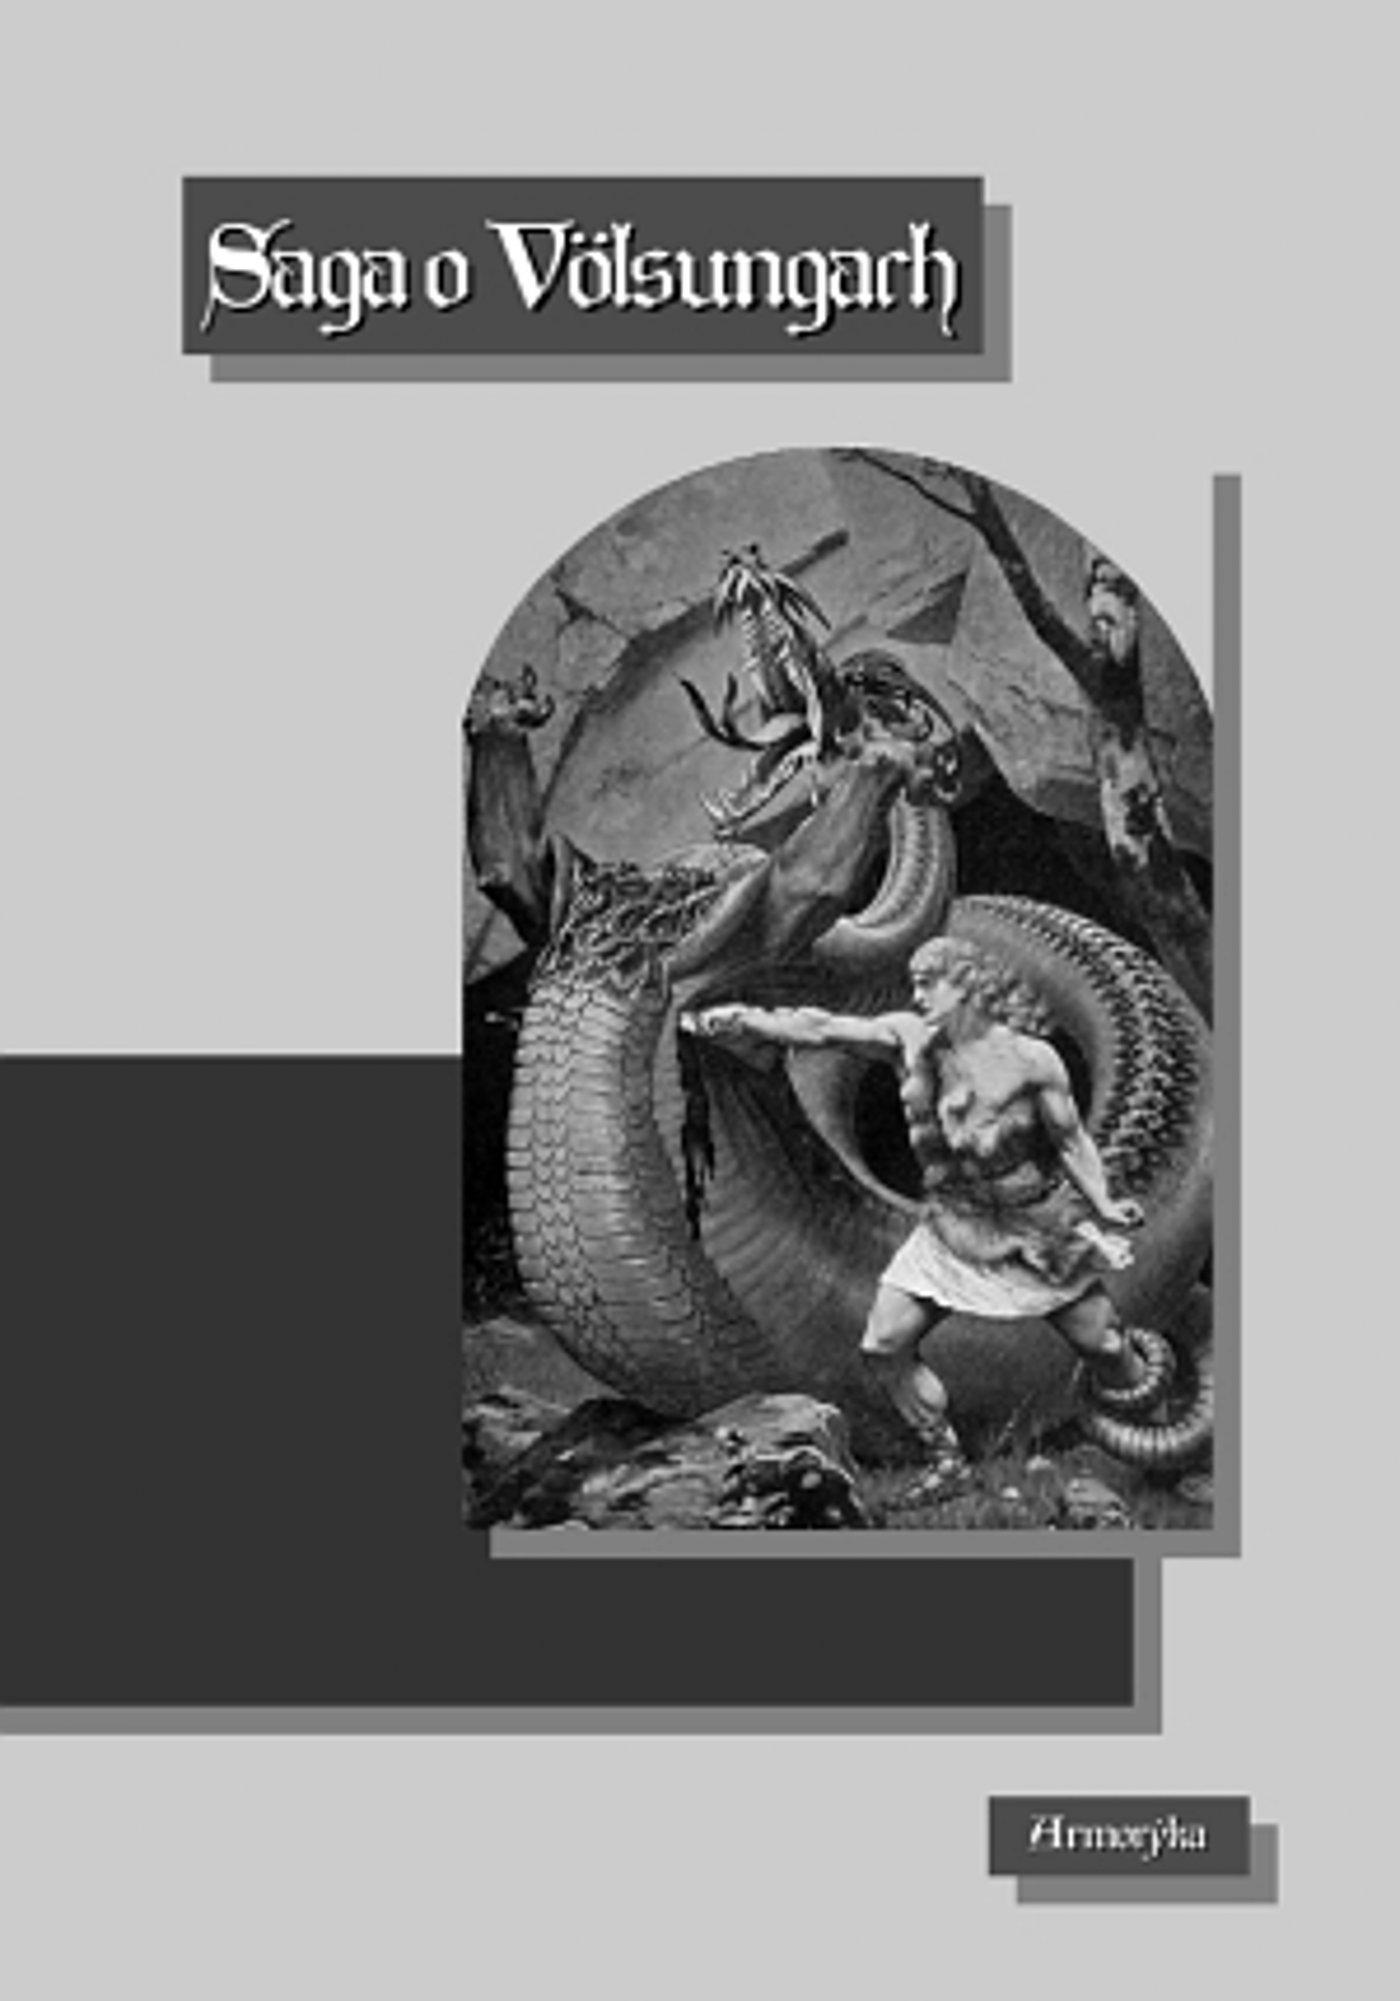 Saga o Völsungach (Wolsungach, Volsungach) - Ebook (Książka EPUB) do pobrania w formacie EPUB